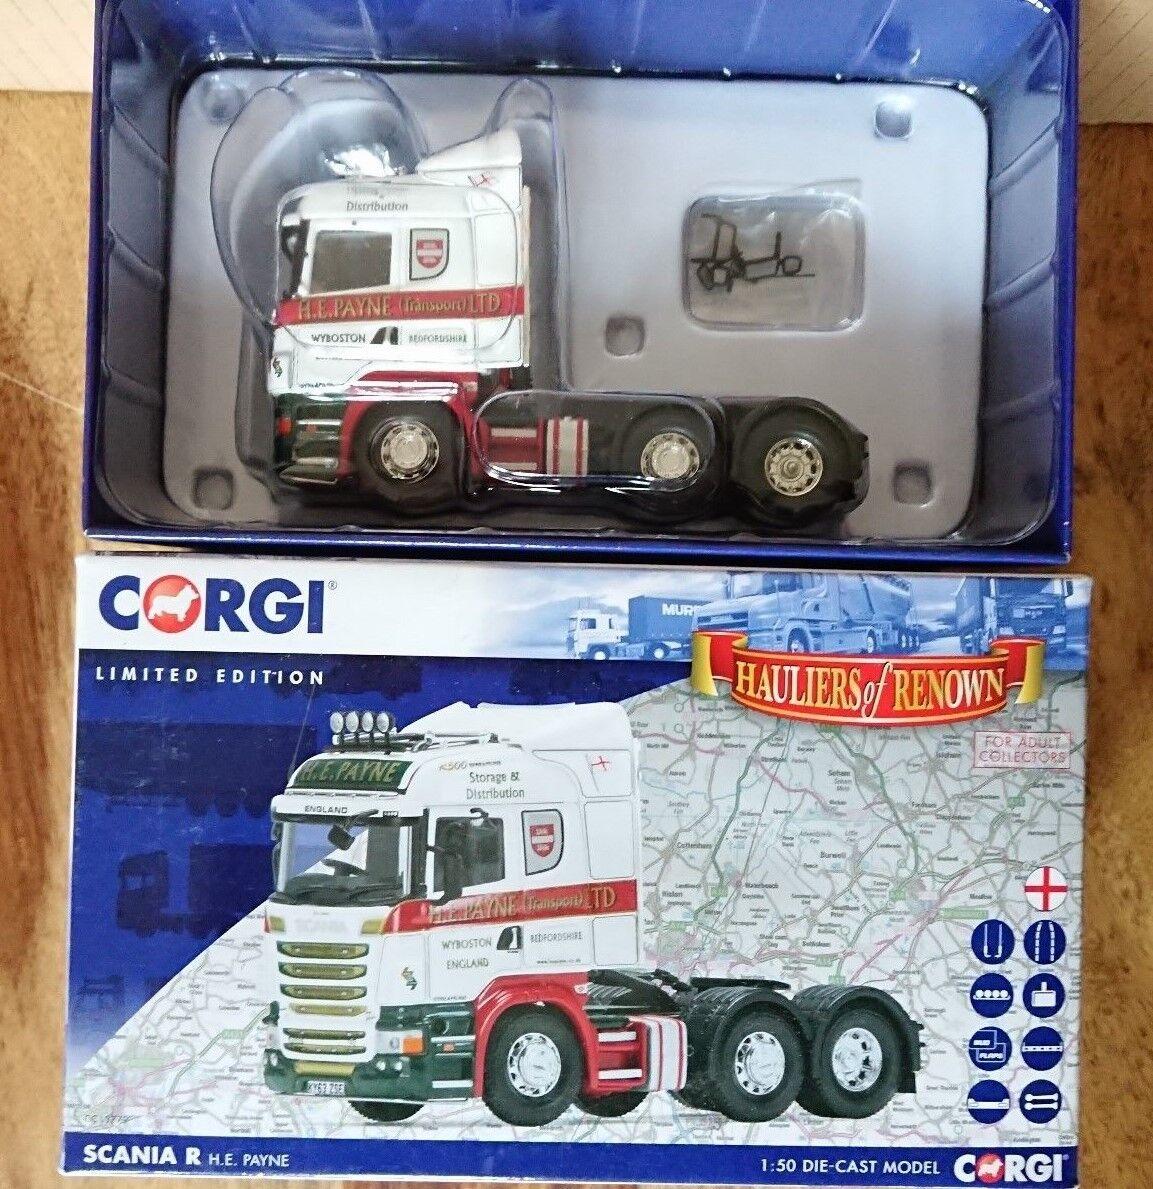 Corgi CC13779 Scania R Tractor Unit H.E. Payne Ltd Edit. No. 0481 of 1000